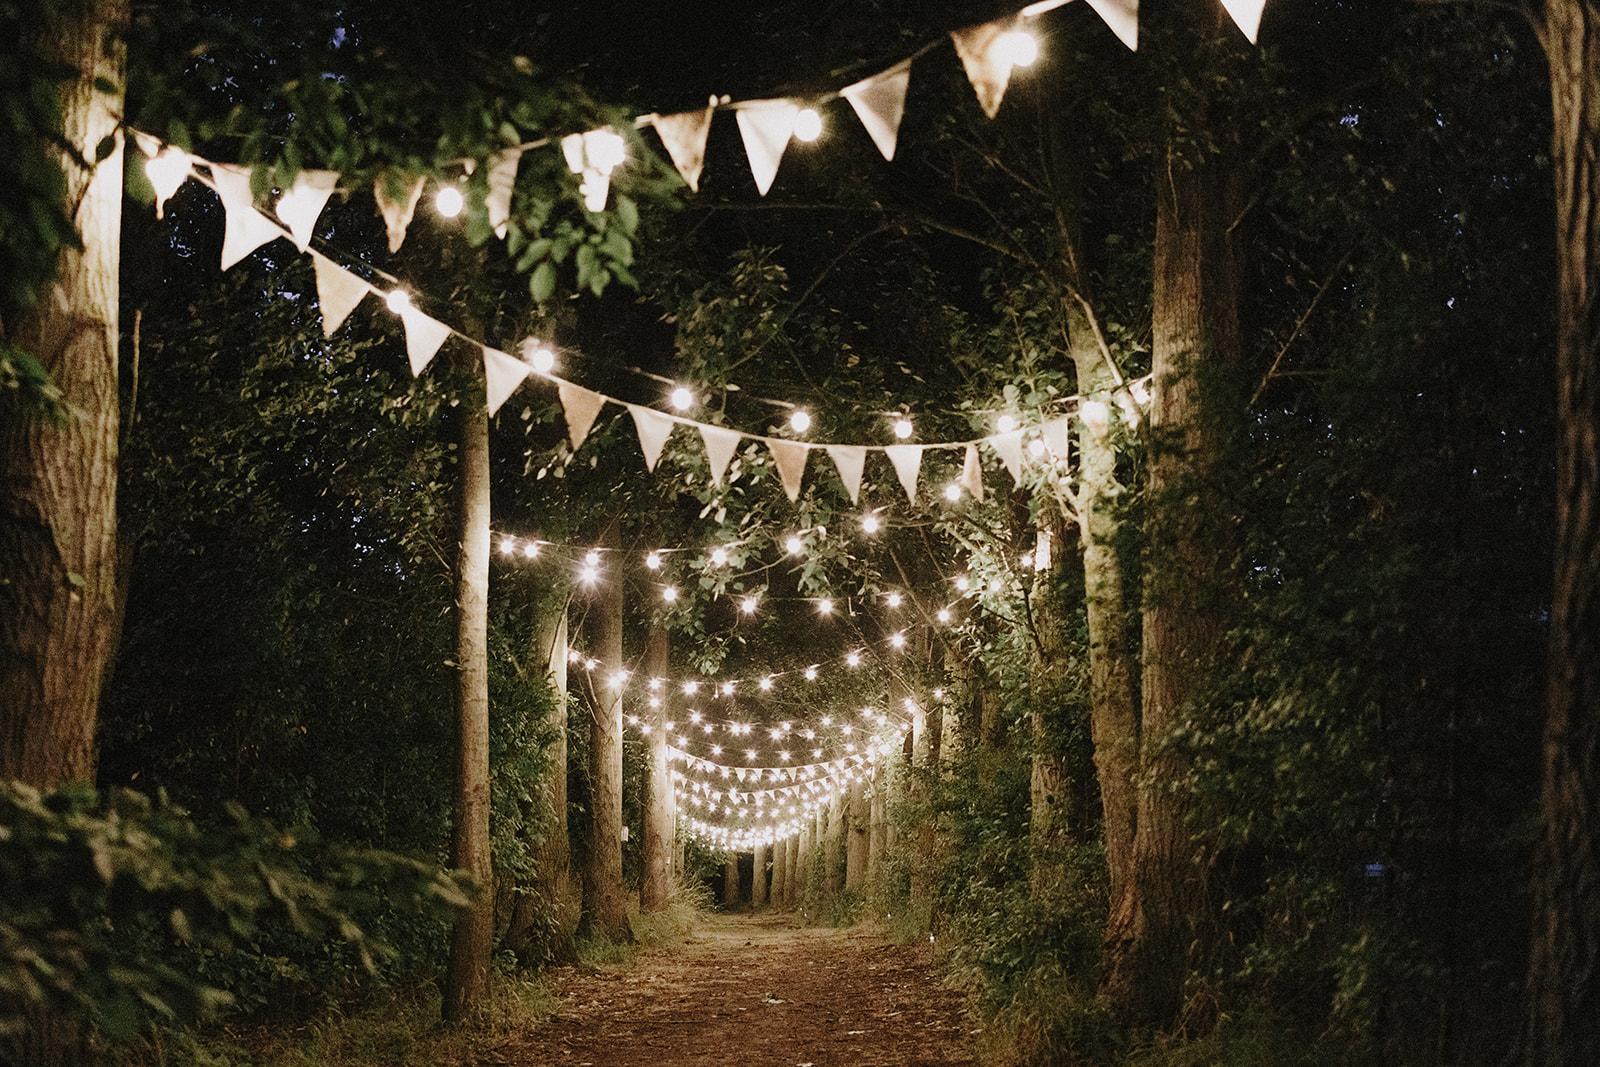 Festoon lit wedding walkway